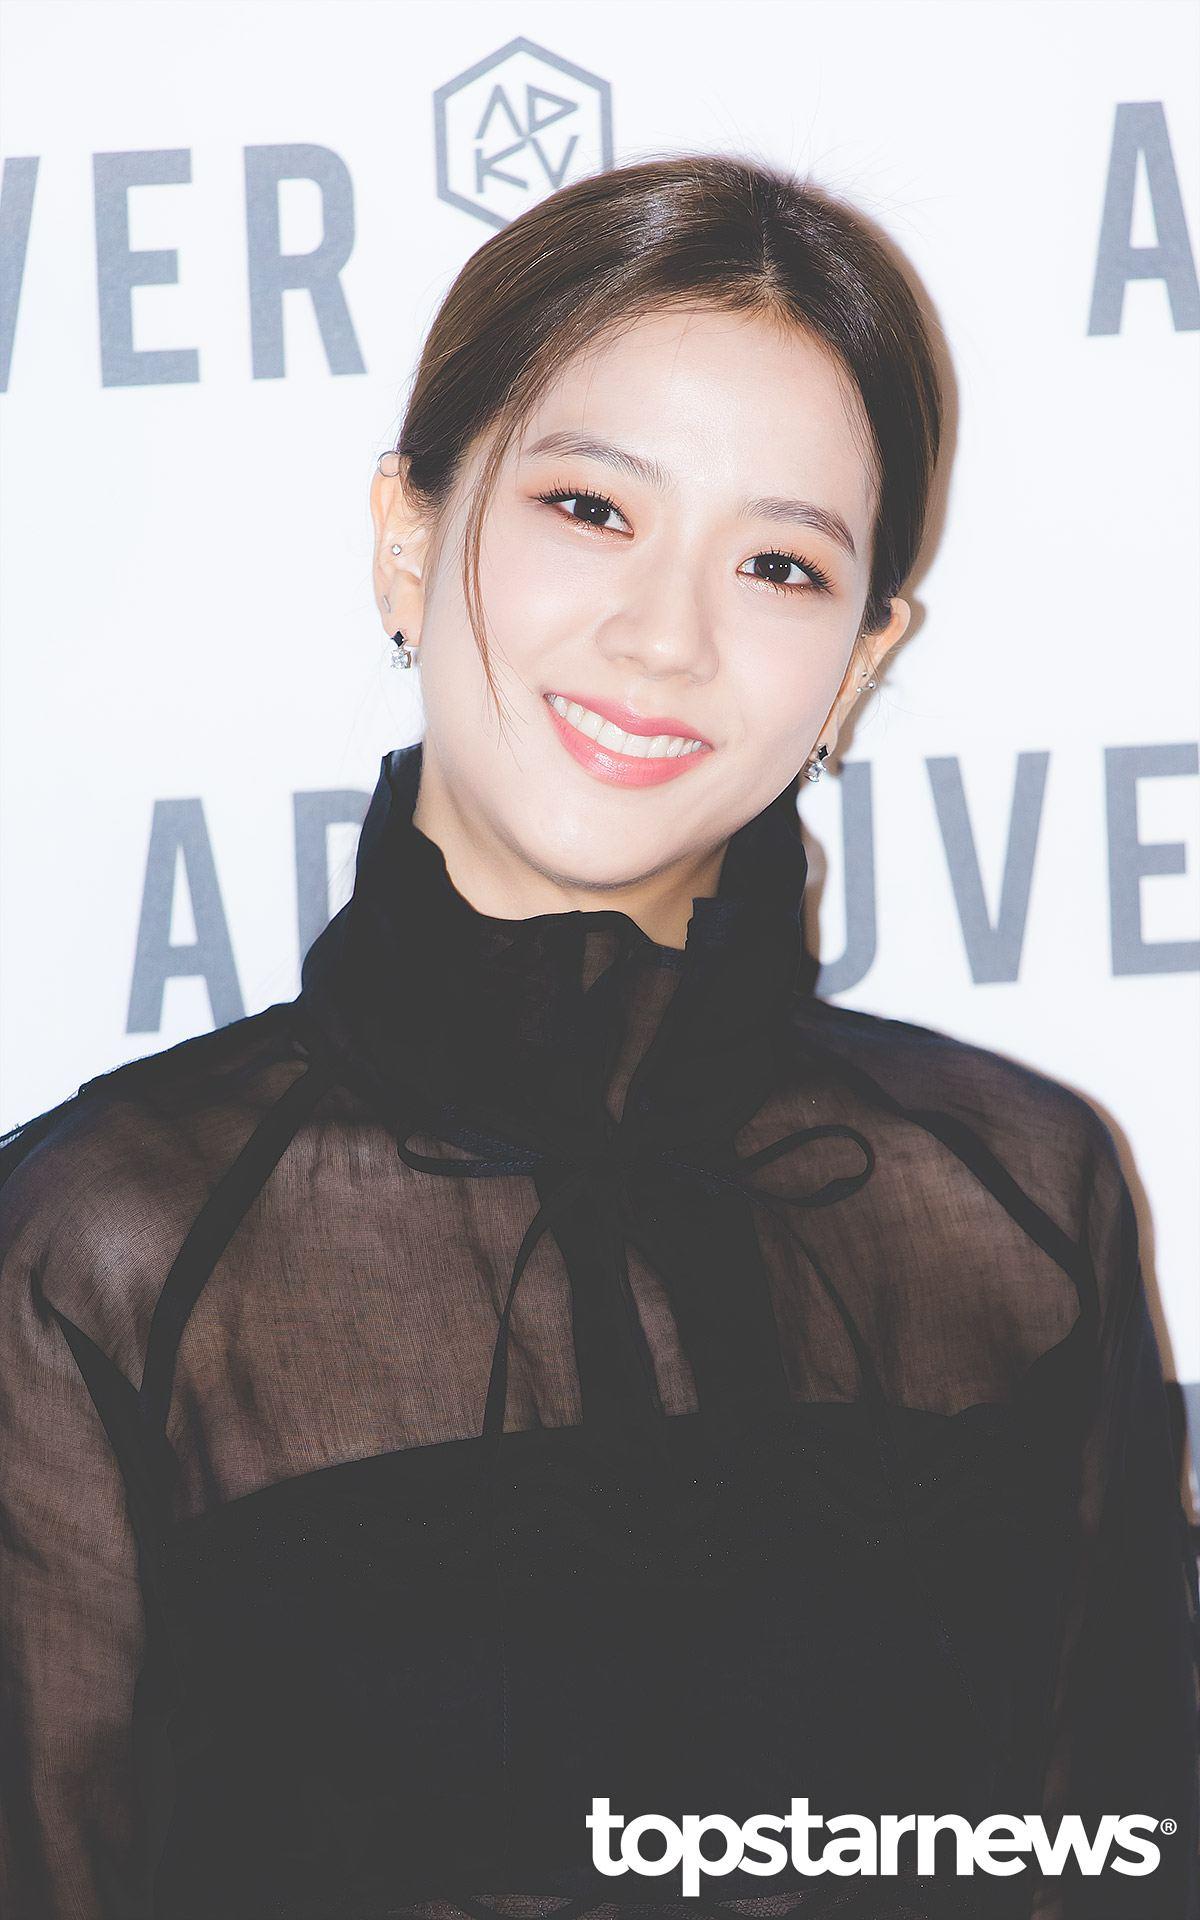 # BLACKPINK - Jisoo 明朗的笑容以及活潑的魅力獲得許多粉絲的喜愛,她的美貌可是在出道之前就引起關注的呢!